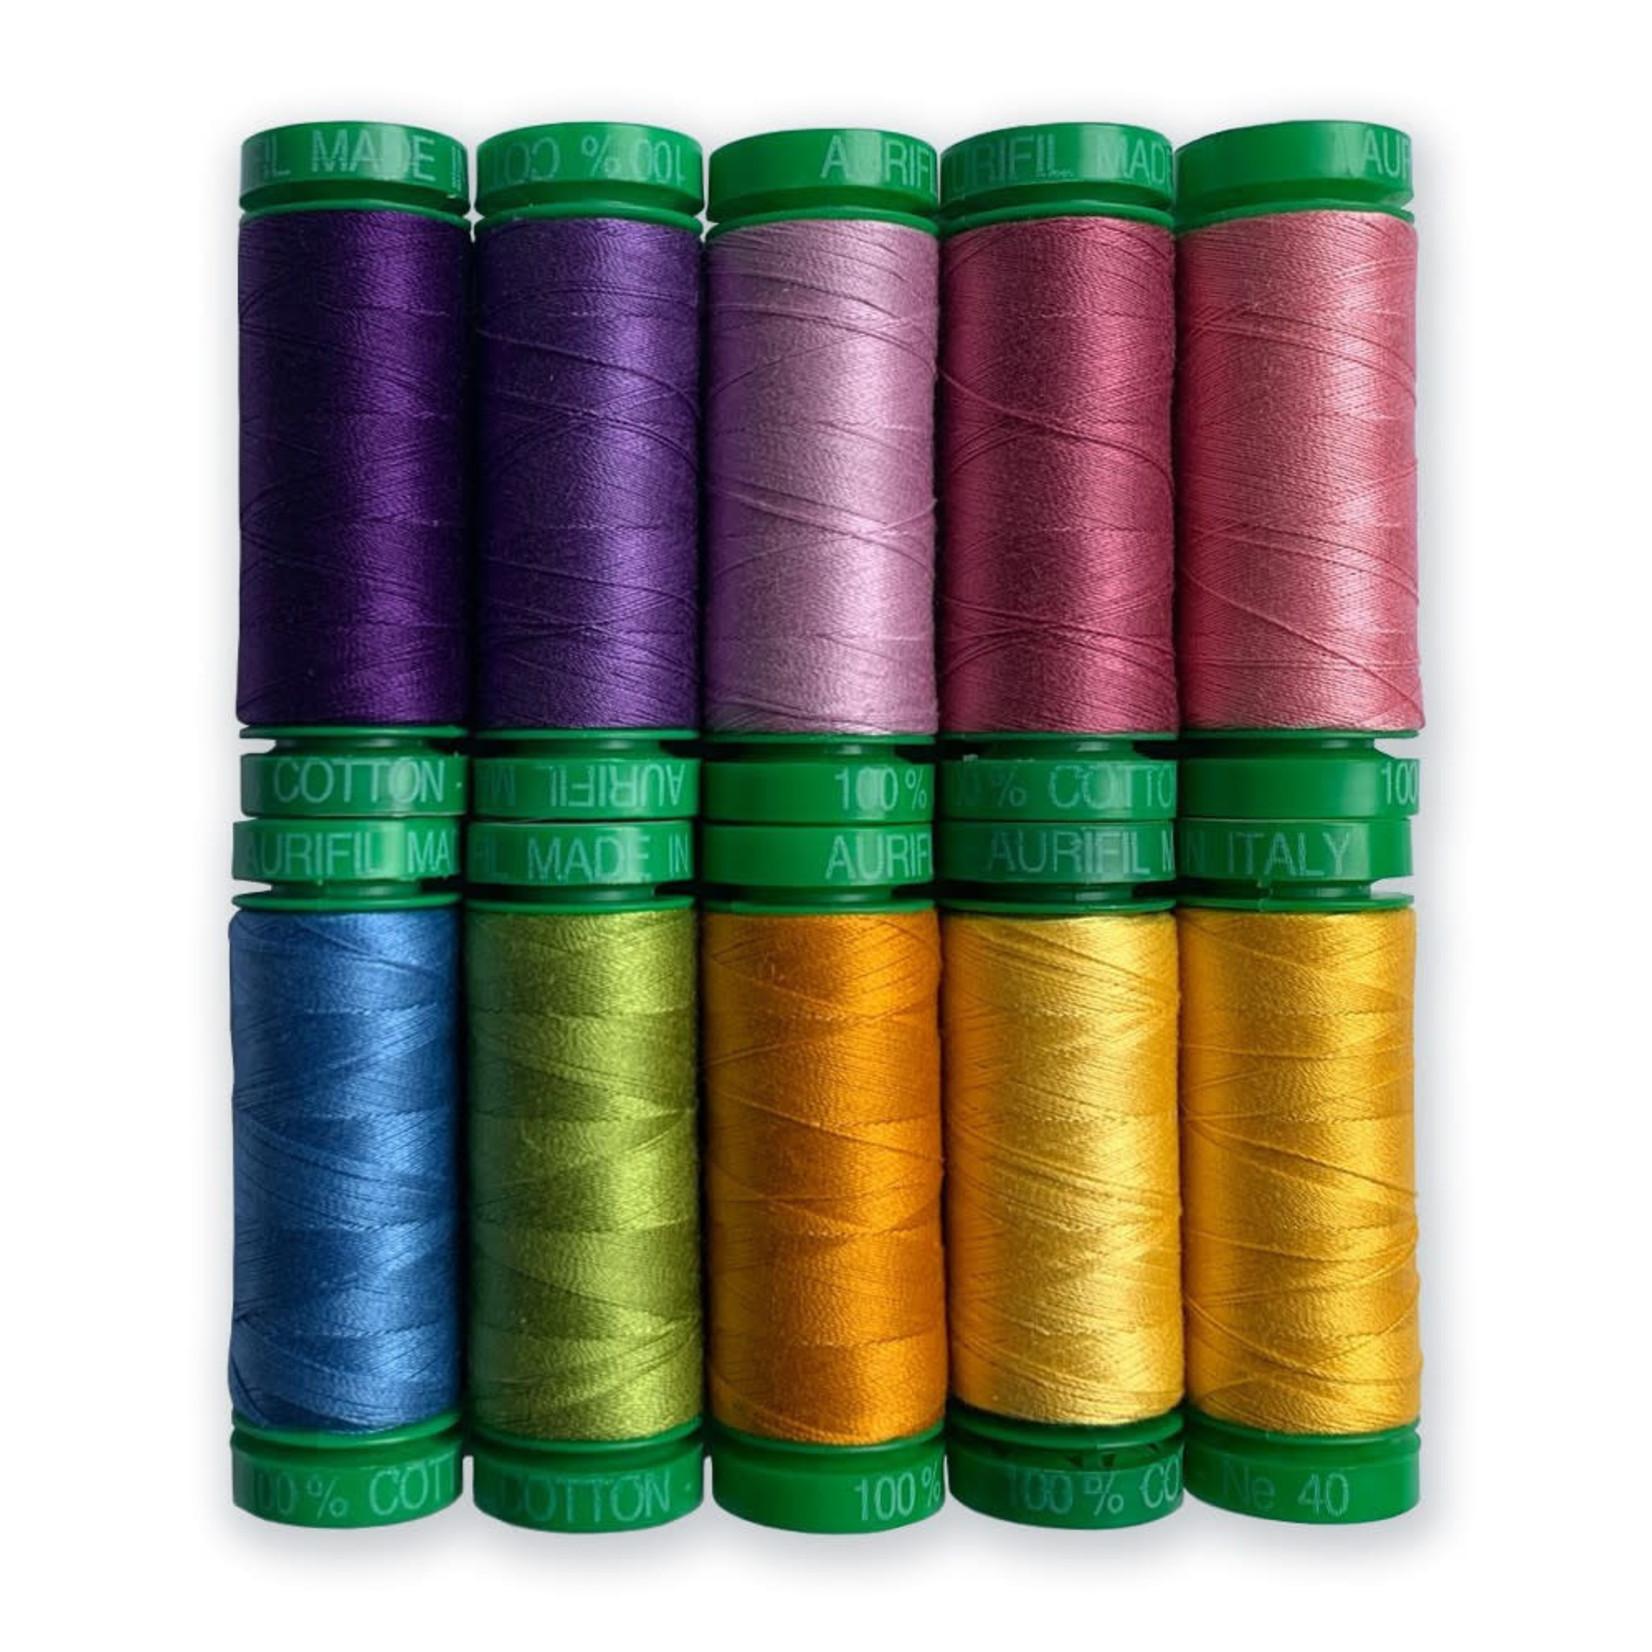 AURIFIL Bliss Thread Collection - Barbara Persing